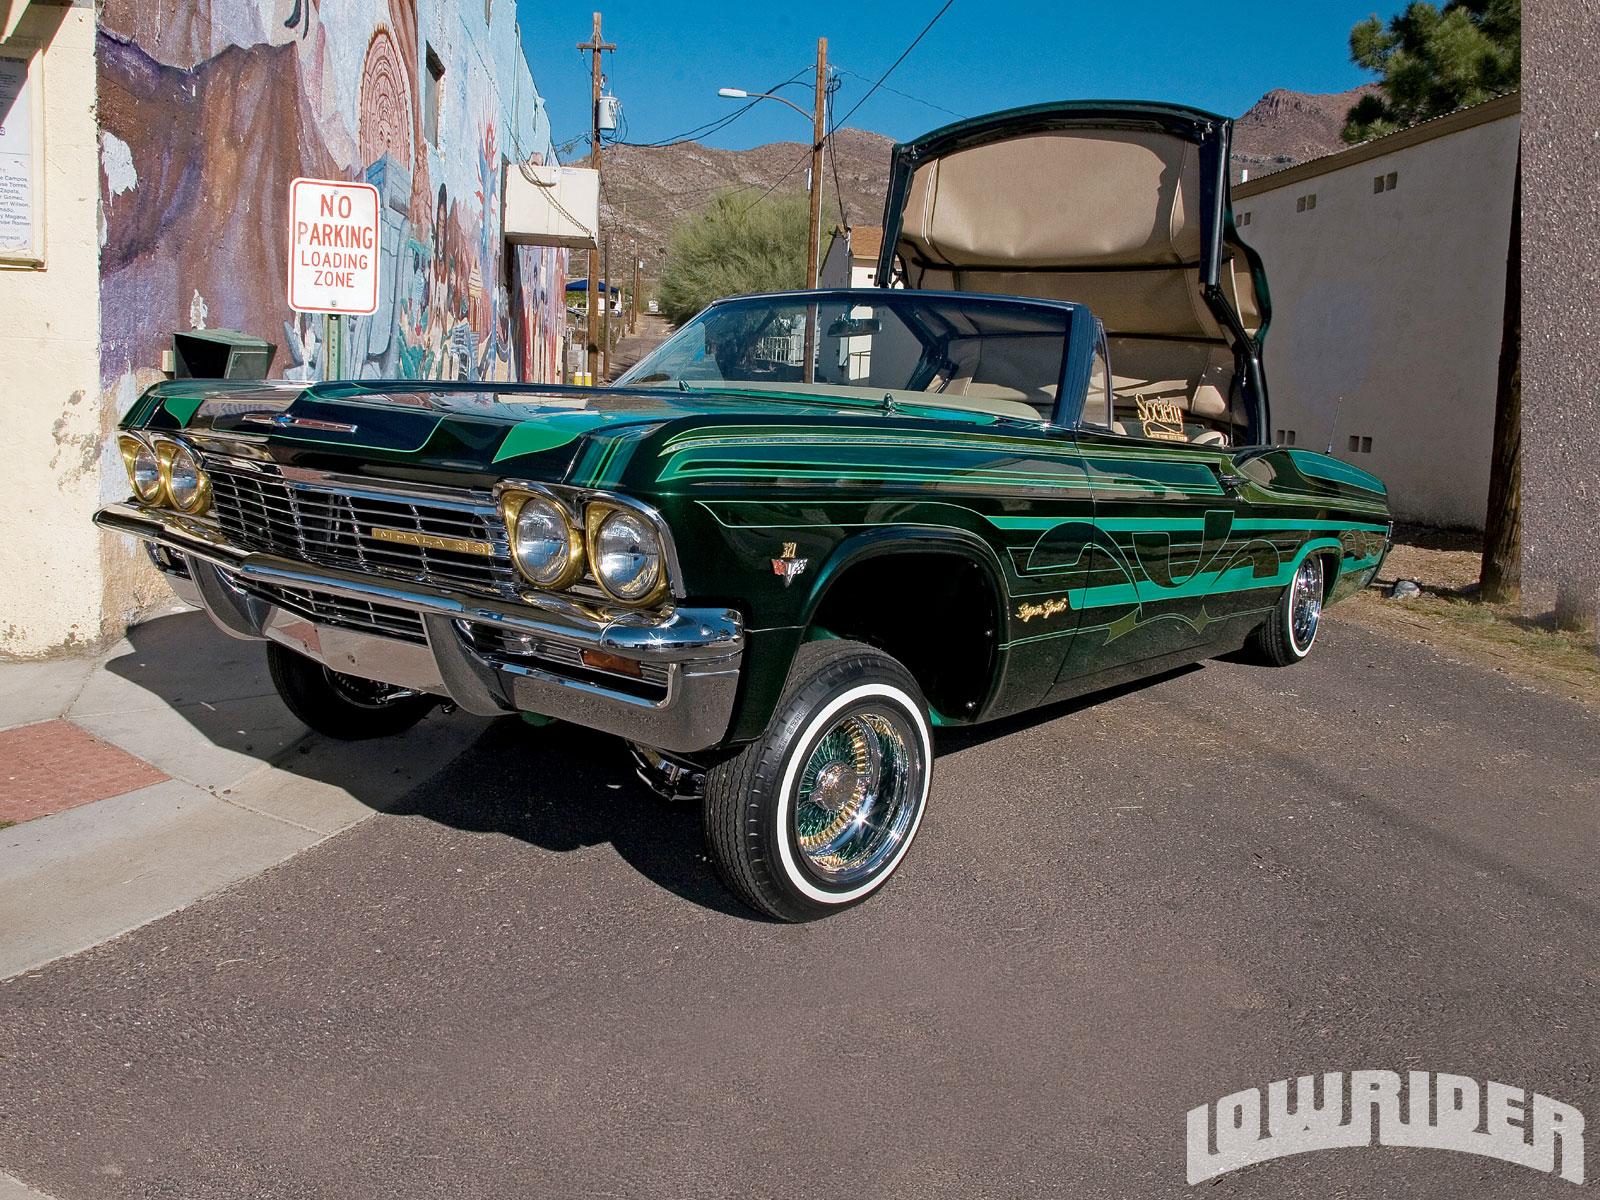 Chevy Silverado Guy >> 1965 Chevrolet Impala Convertible - Lowrider Magazine